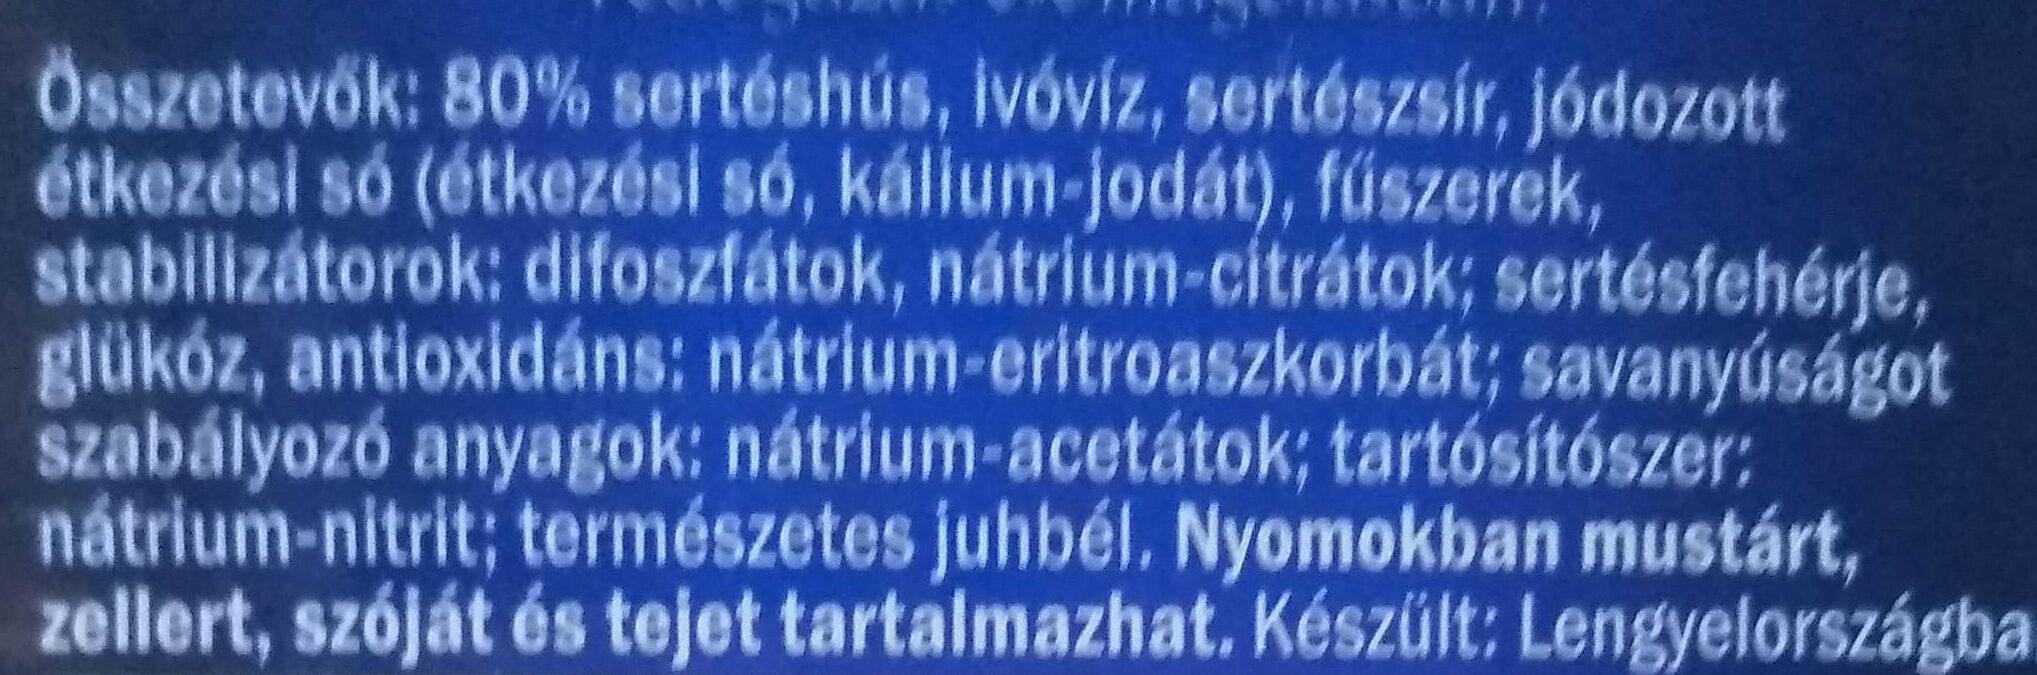 Bécsi roppanós - Ingrédients - hu